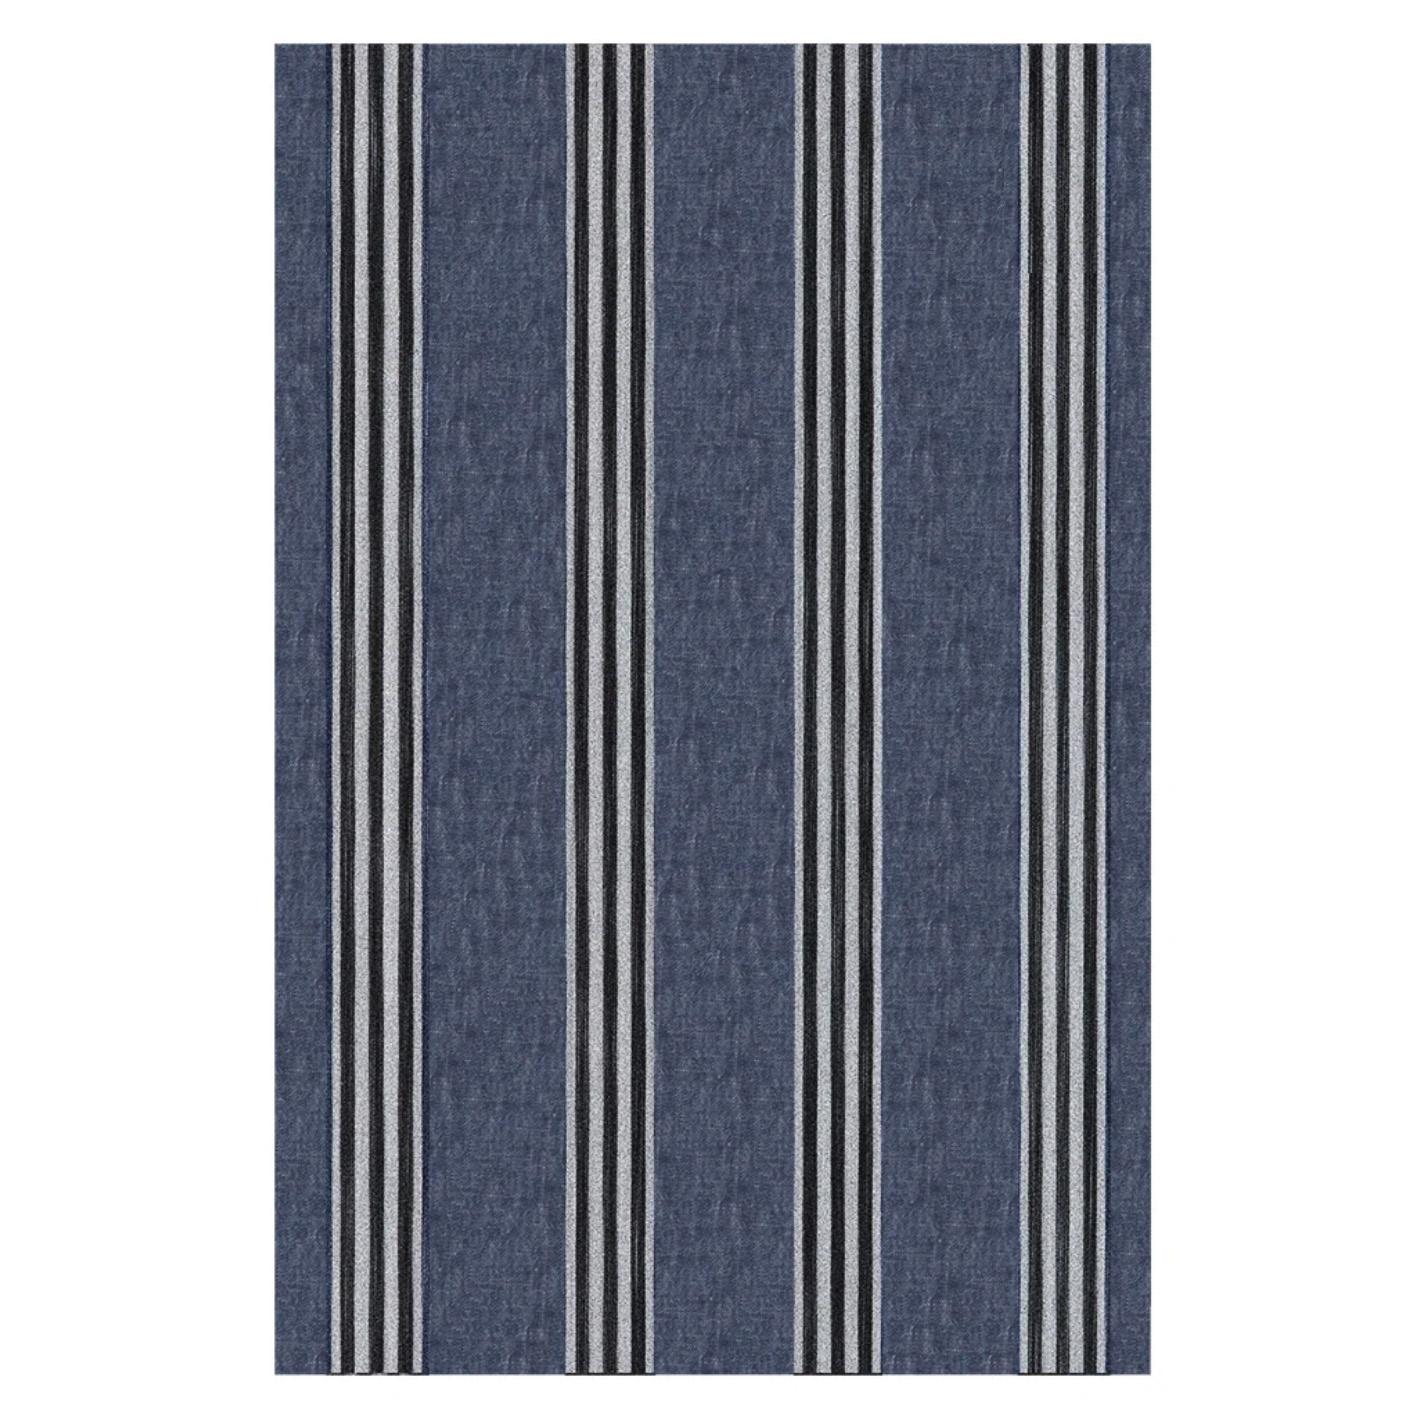 Corte Table Linen Set with 6 Napkins - Indigo-3